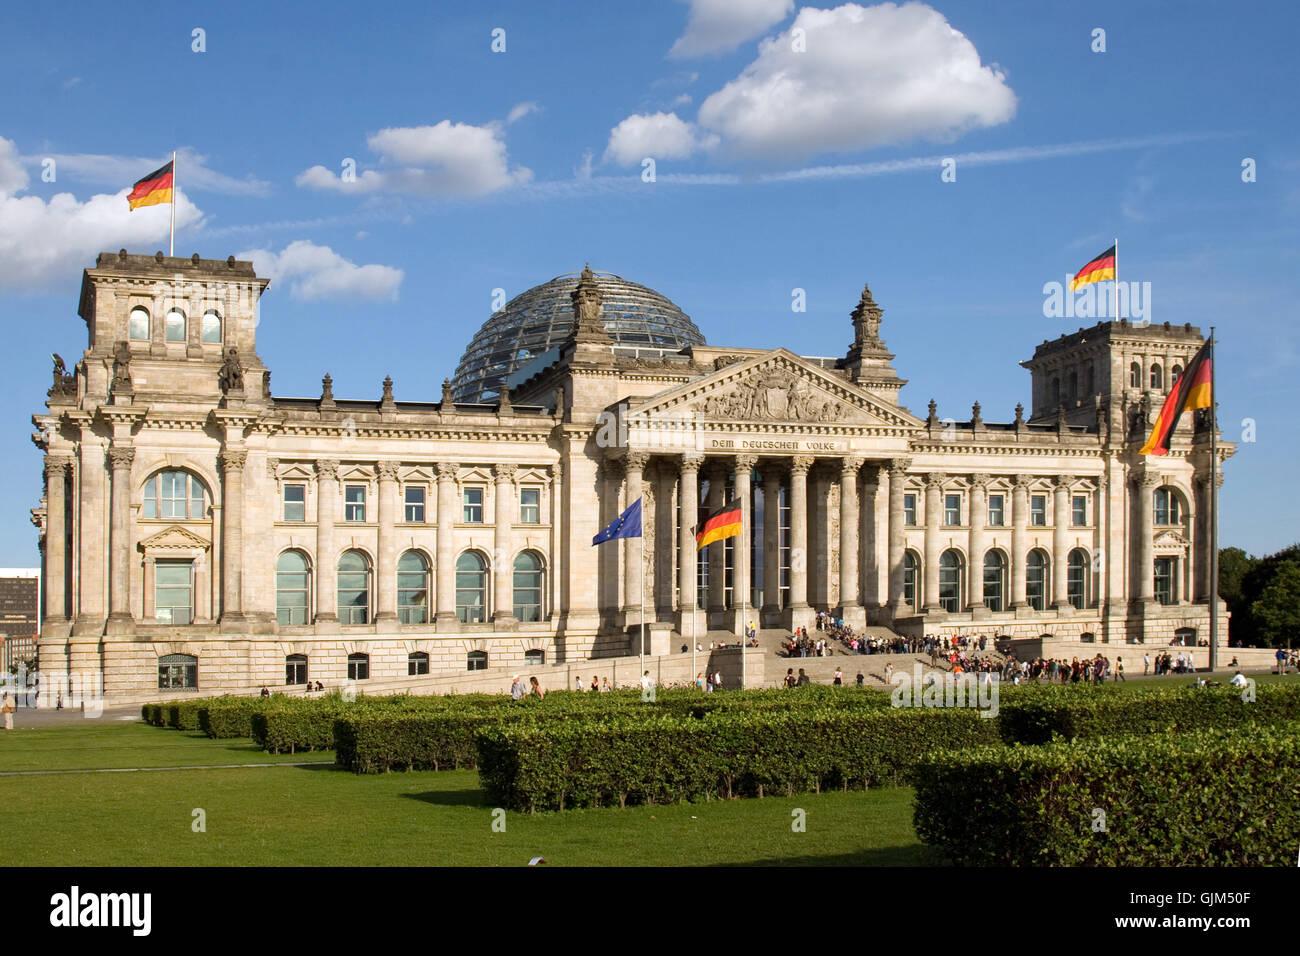 parliament bundestag german parliament (lower house) - Stock Image